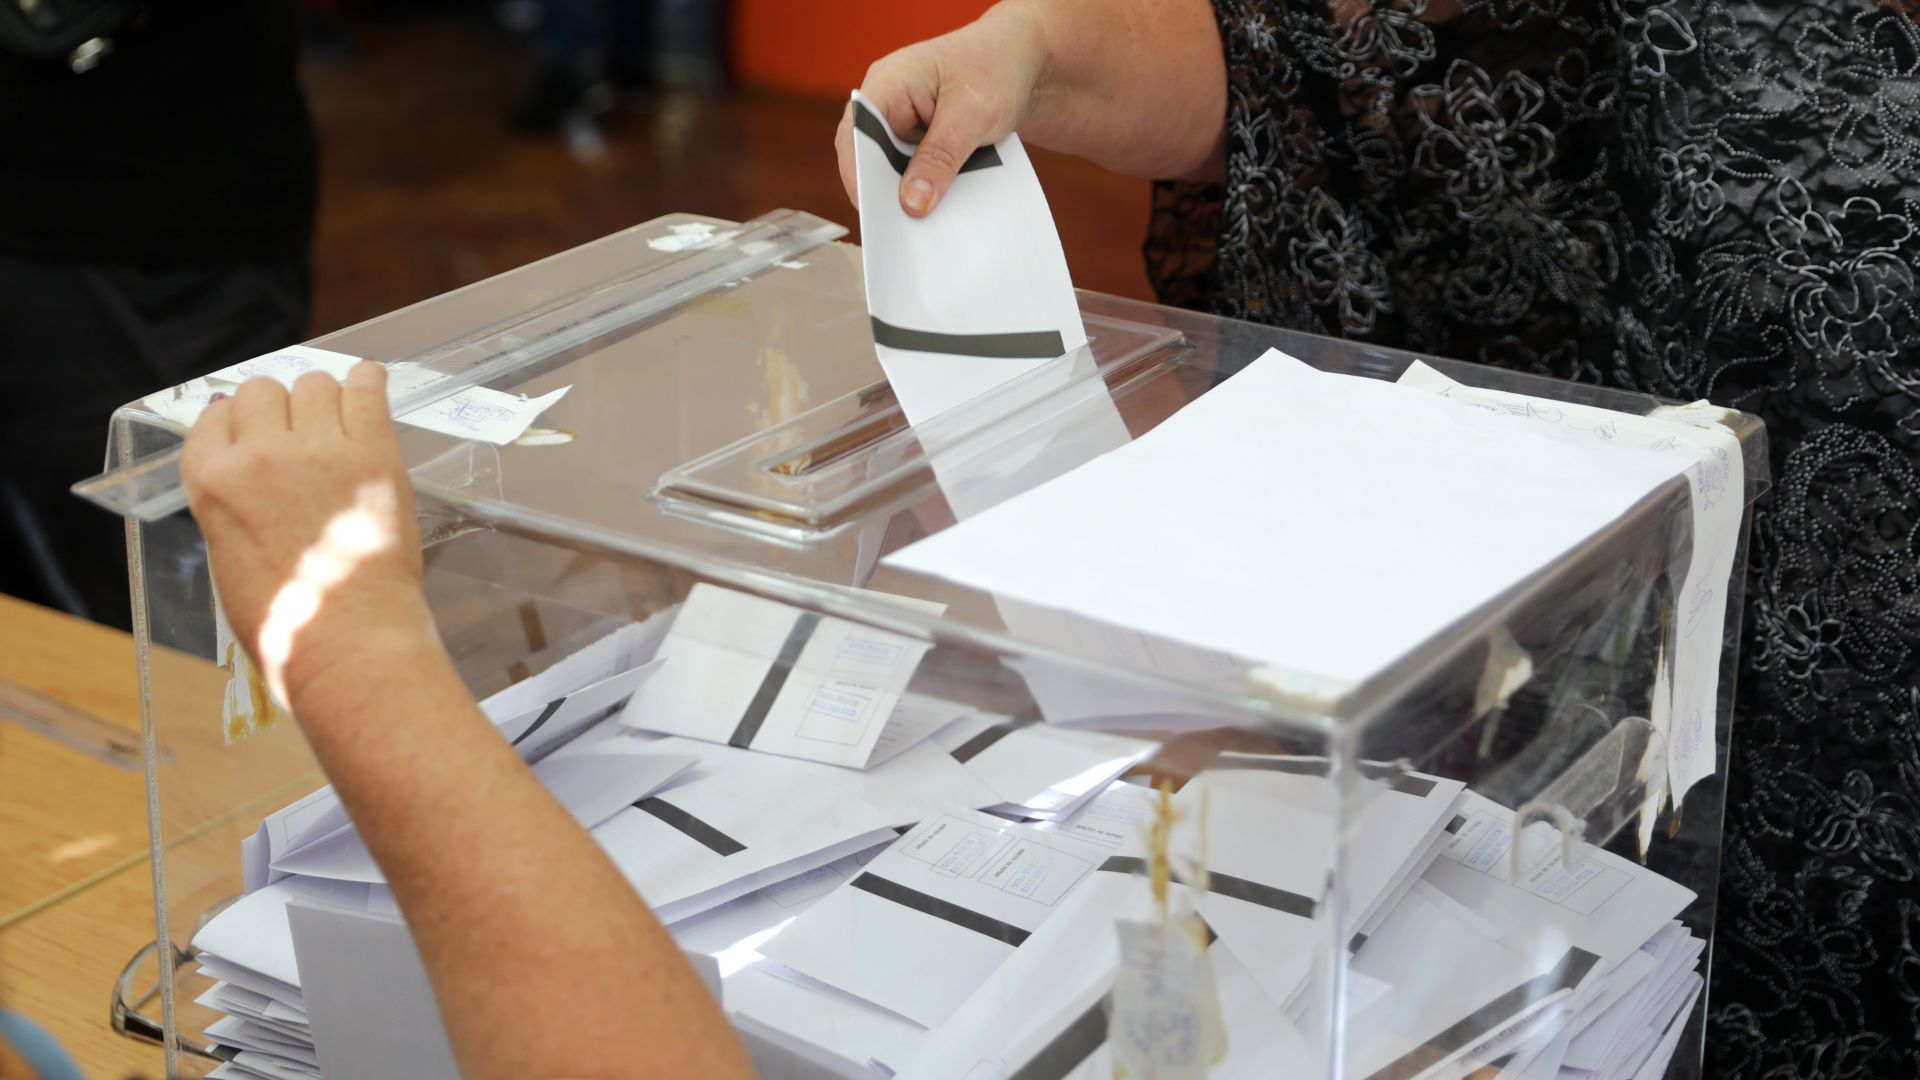 Русенци гласуват по-активно на тези избори